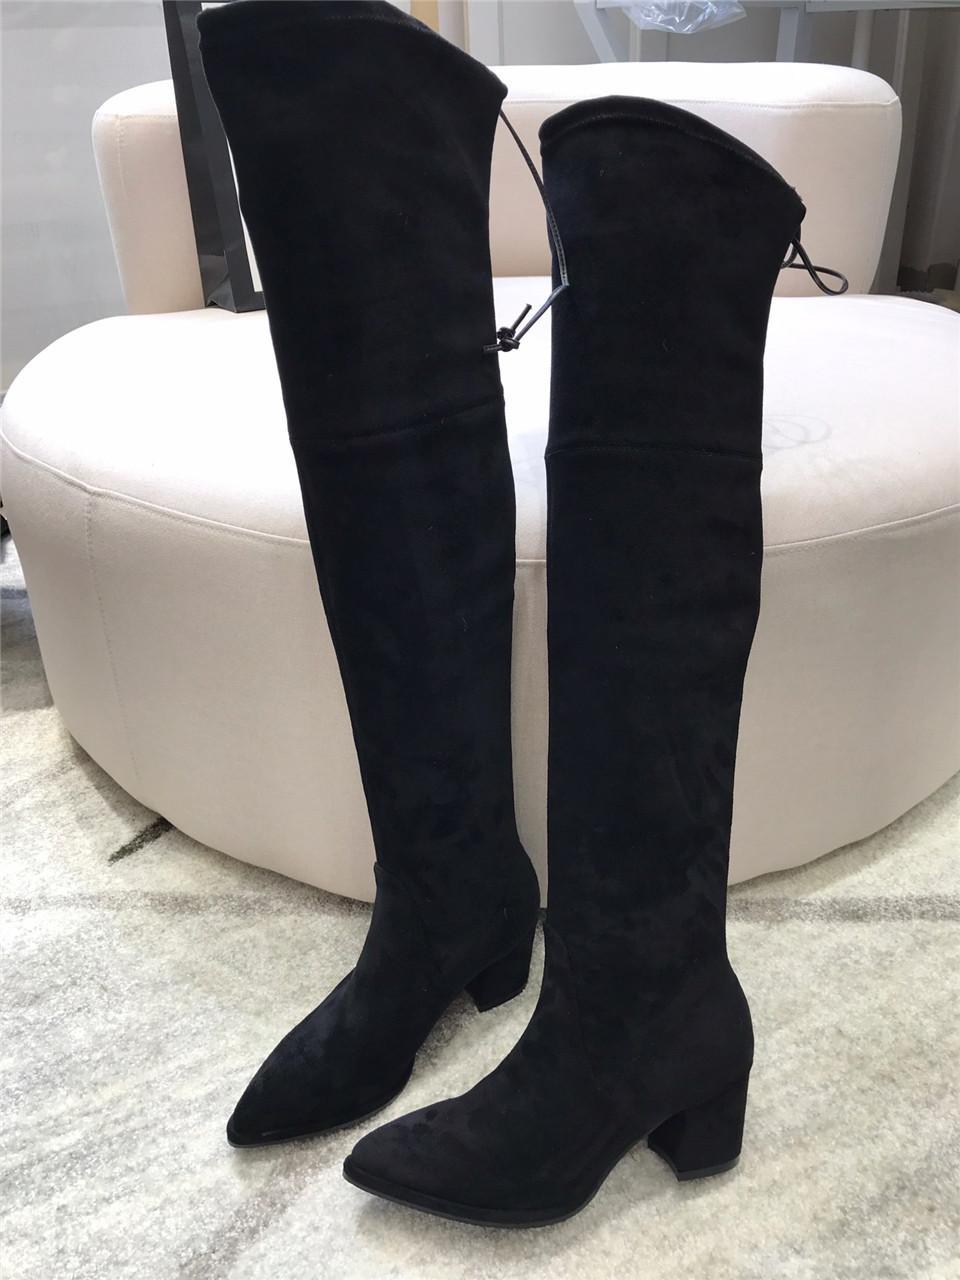 2021 Damenmode über den Kniestiefel städtische sexy frauen stiefel schwarze niedrig hohe dicke ferse high heels